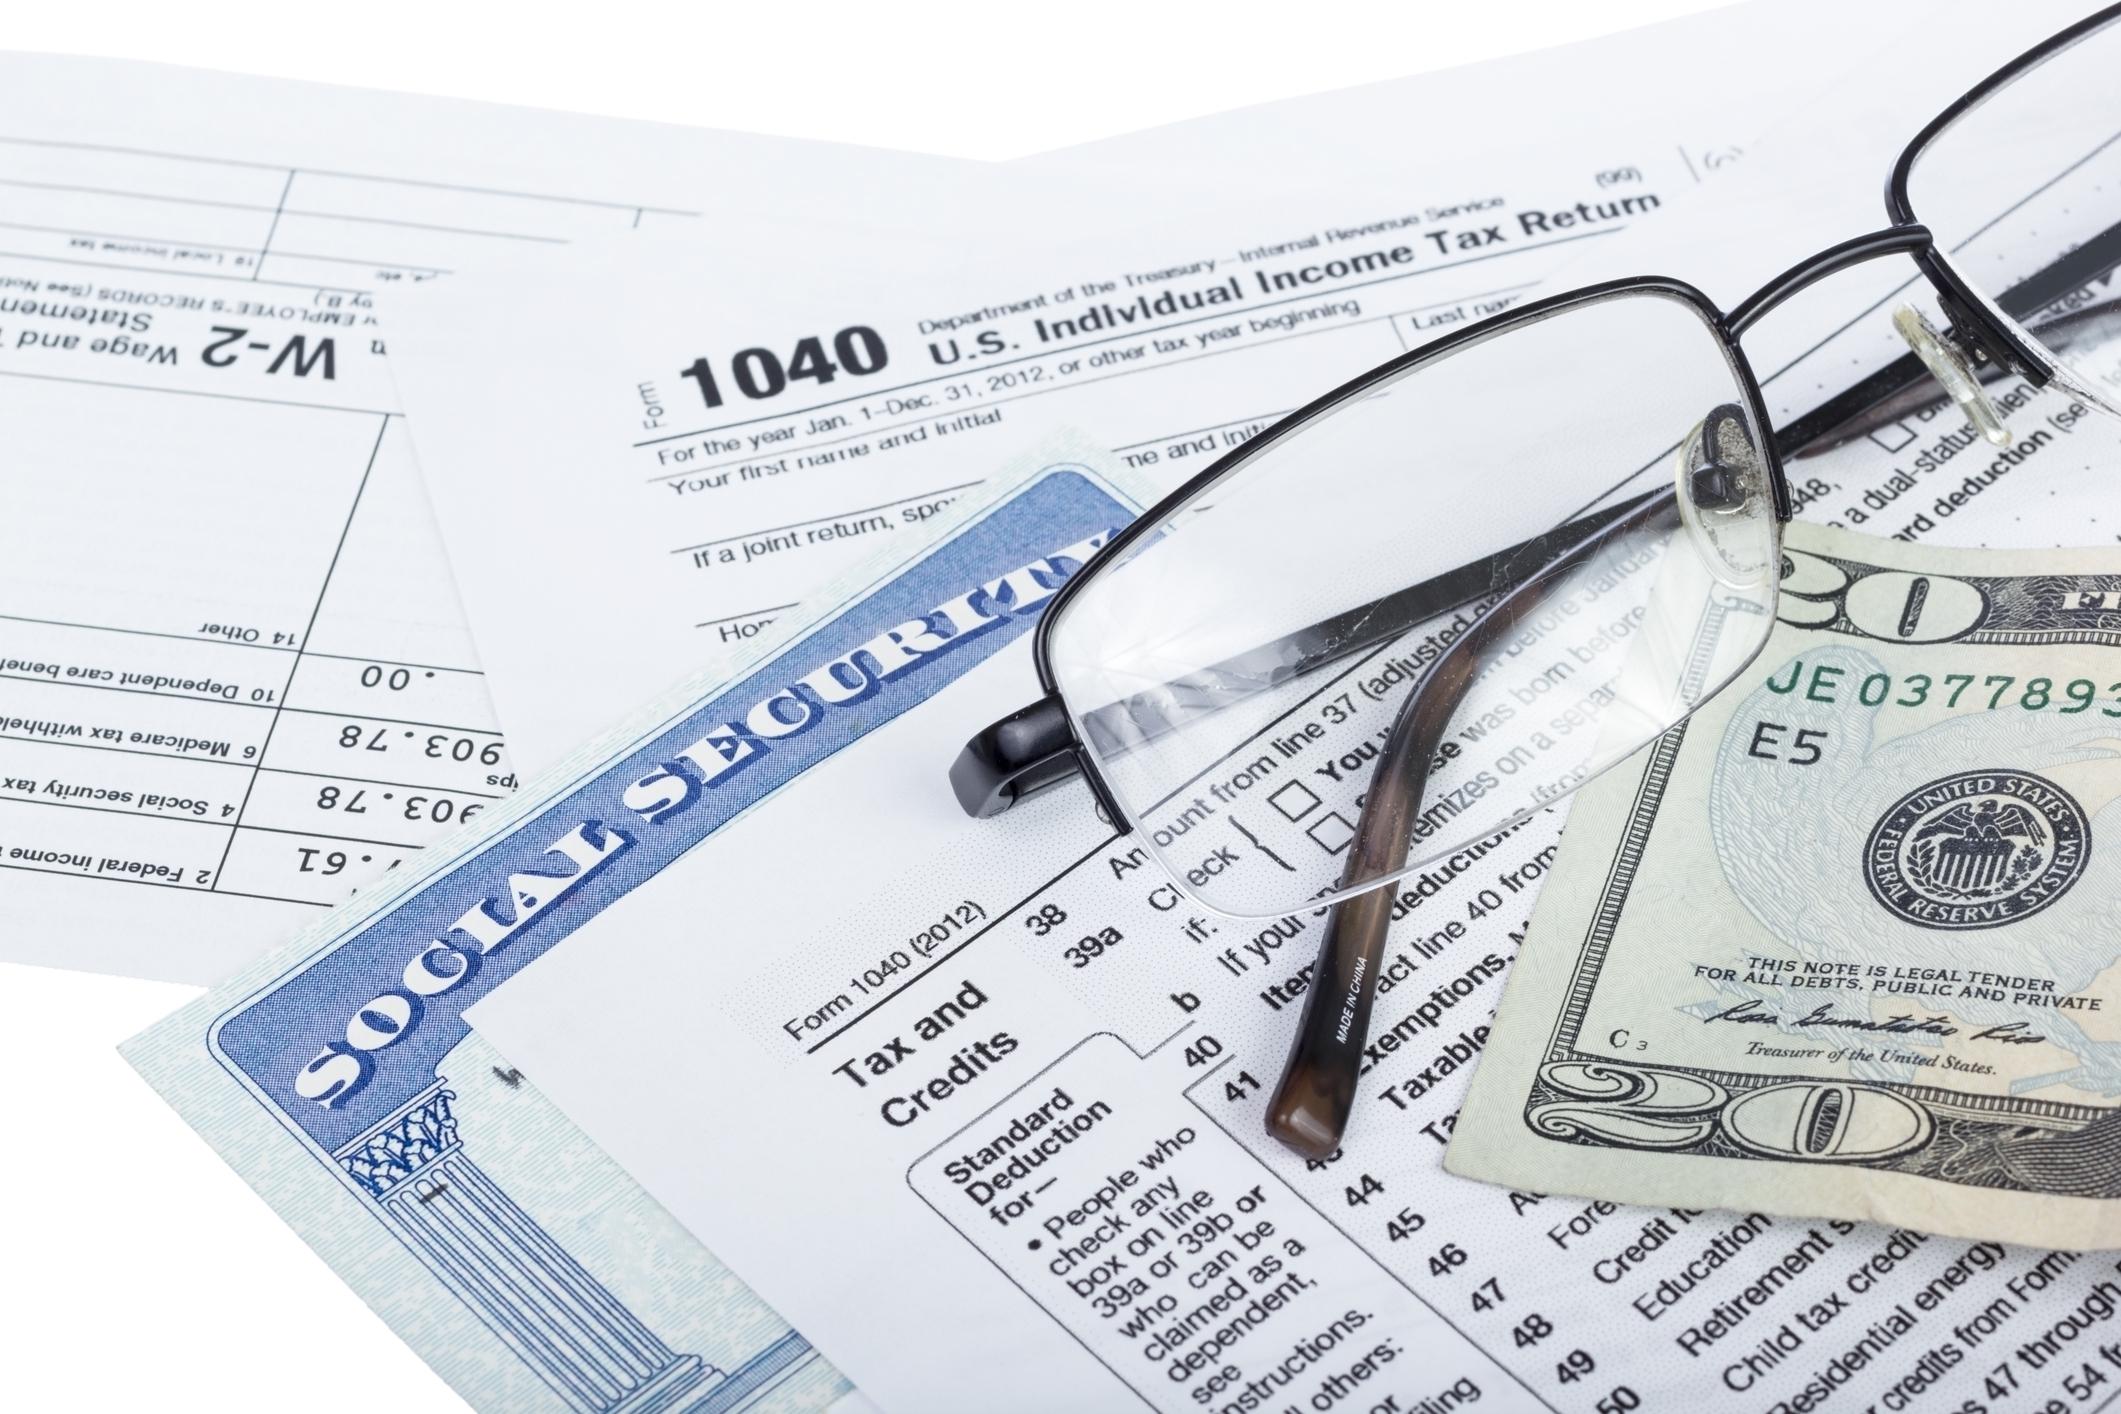 A Social Security card lying atop an IRS tax form.